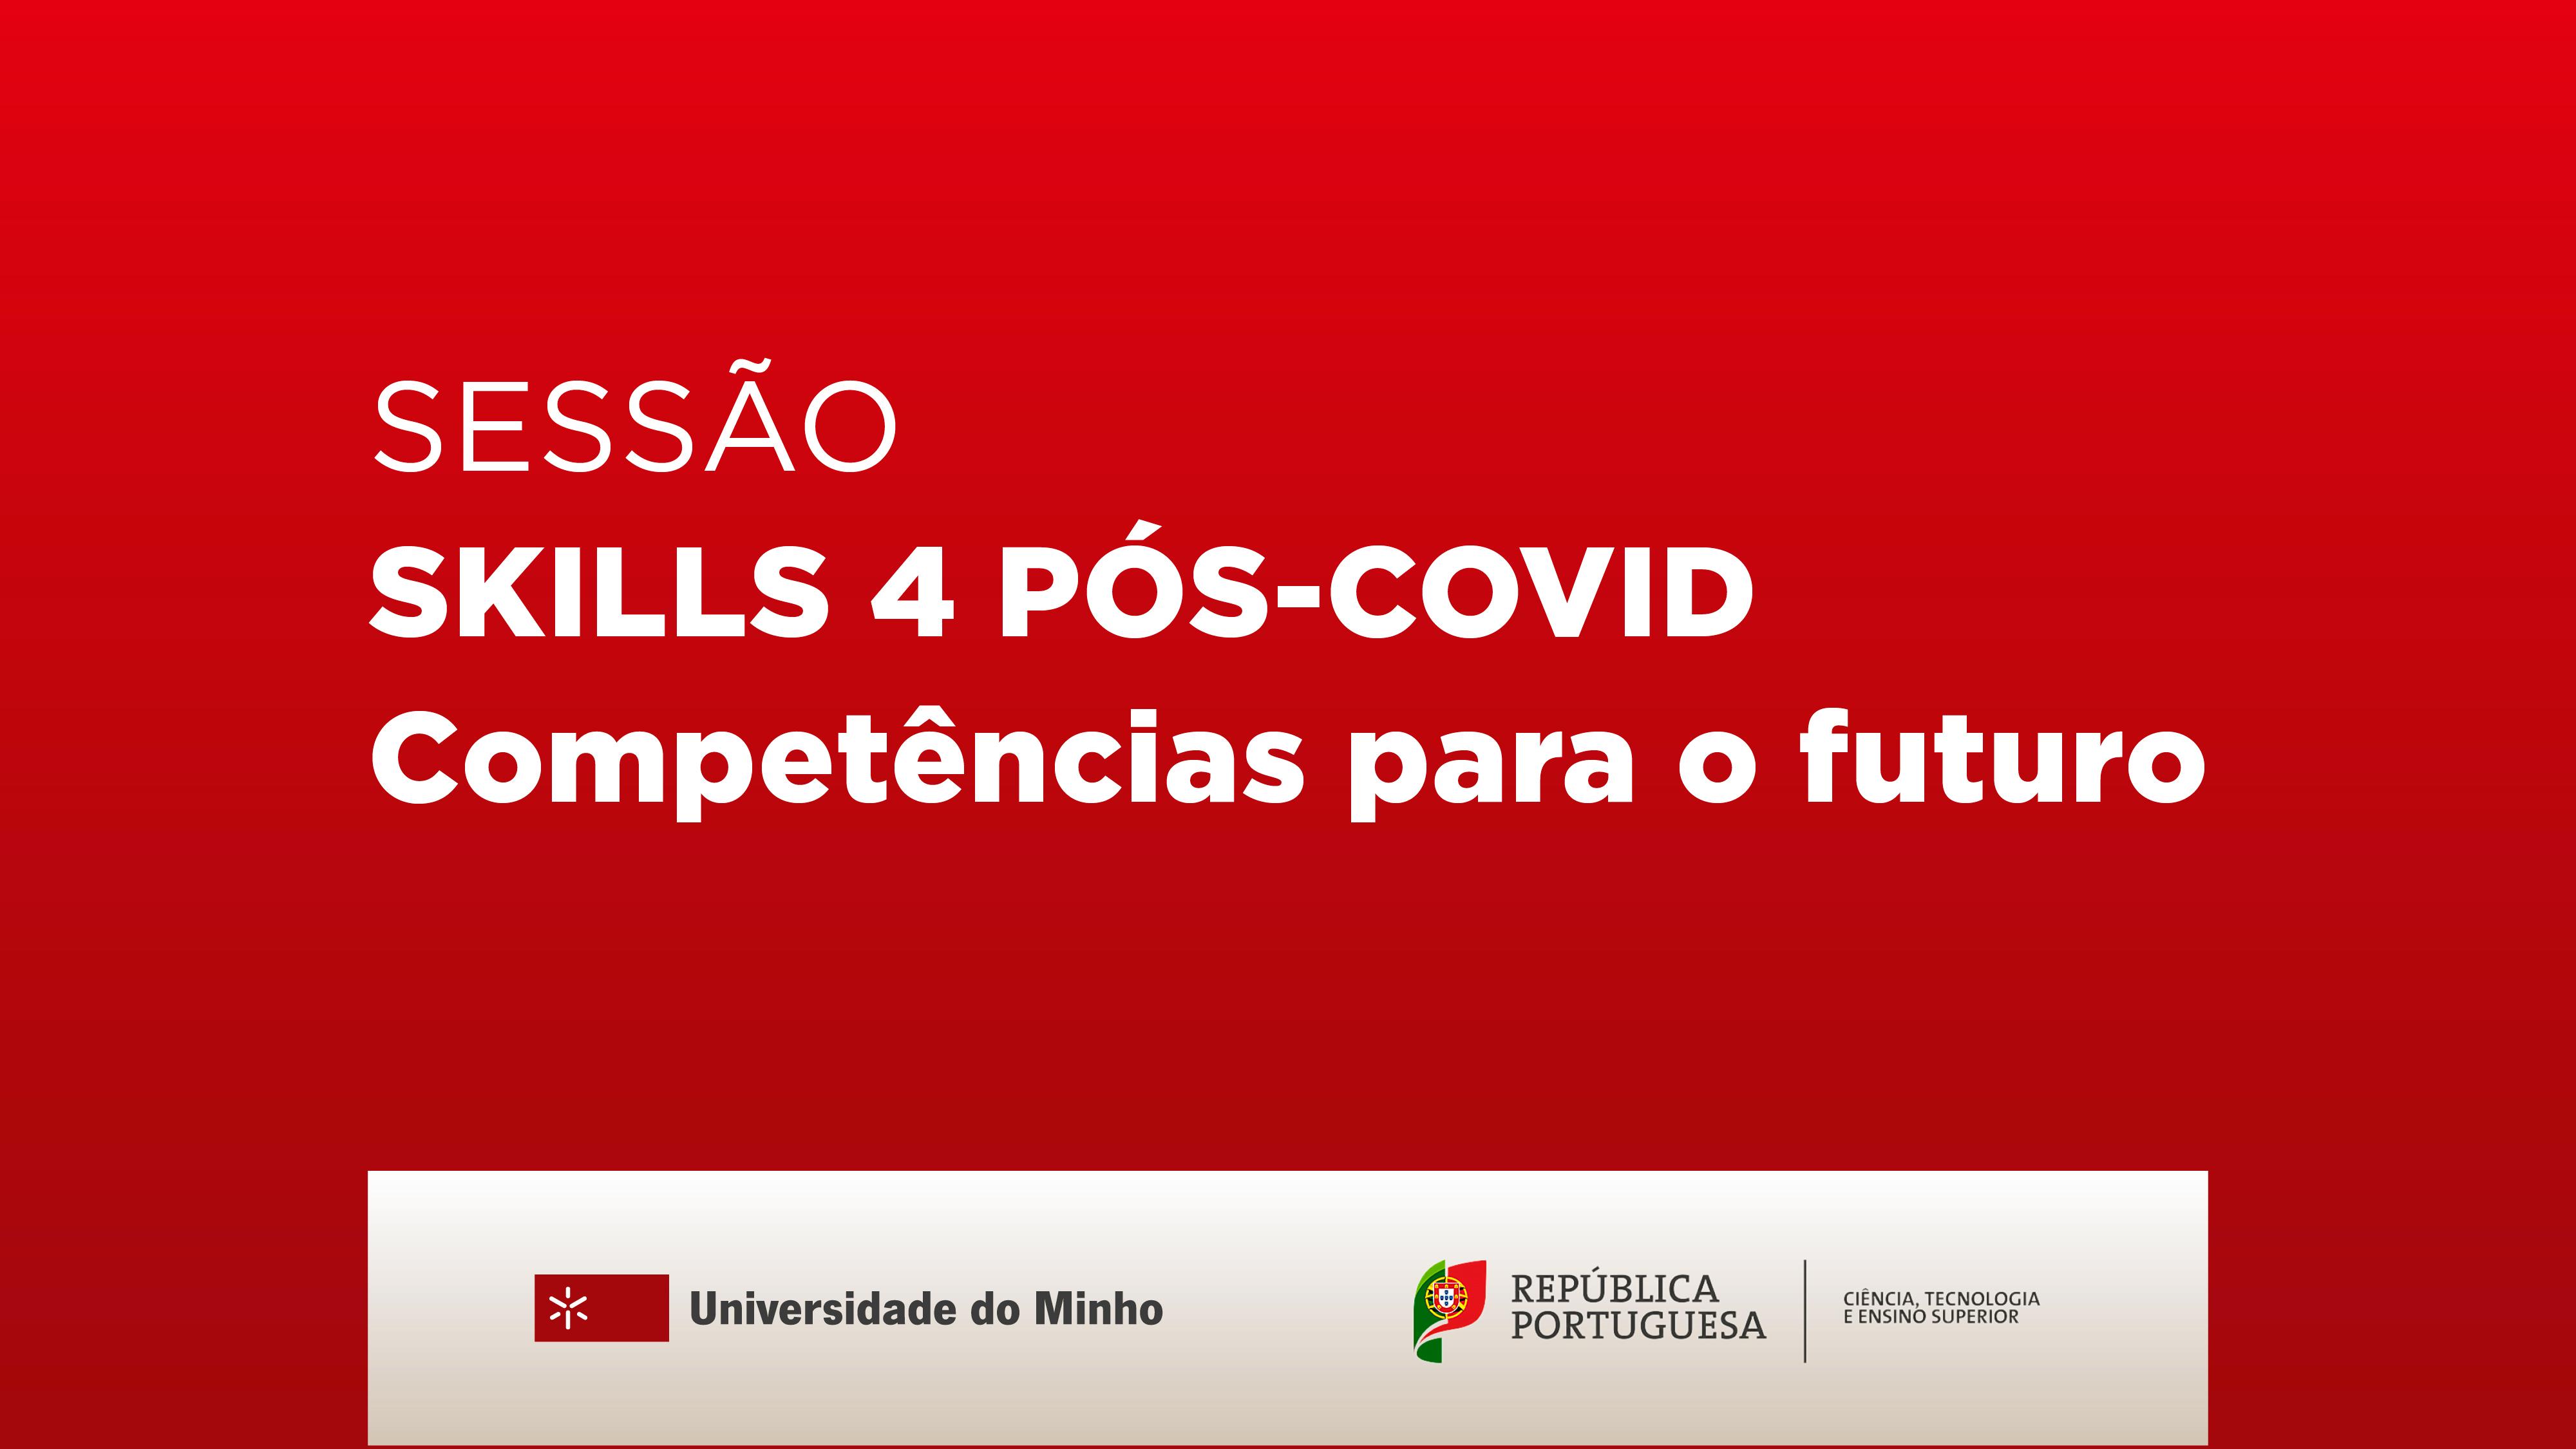 Skills 4 pós-Covid – Competências para o Futuro